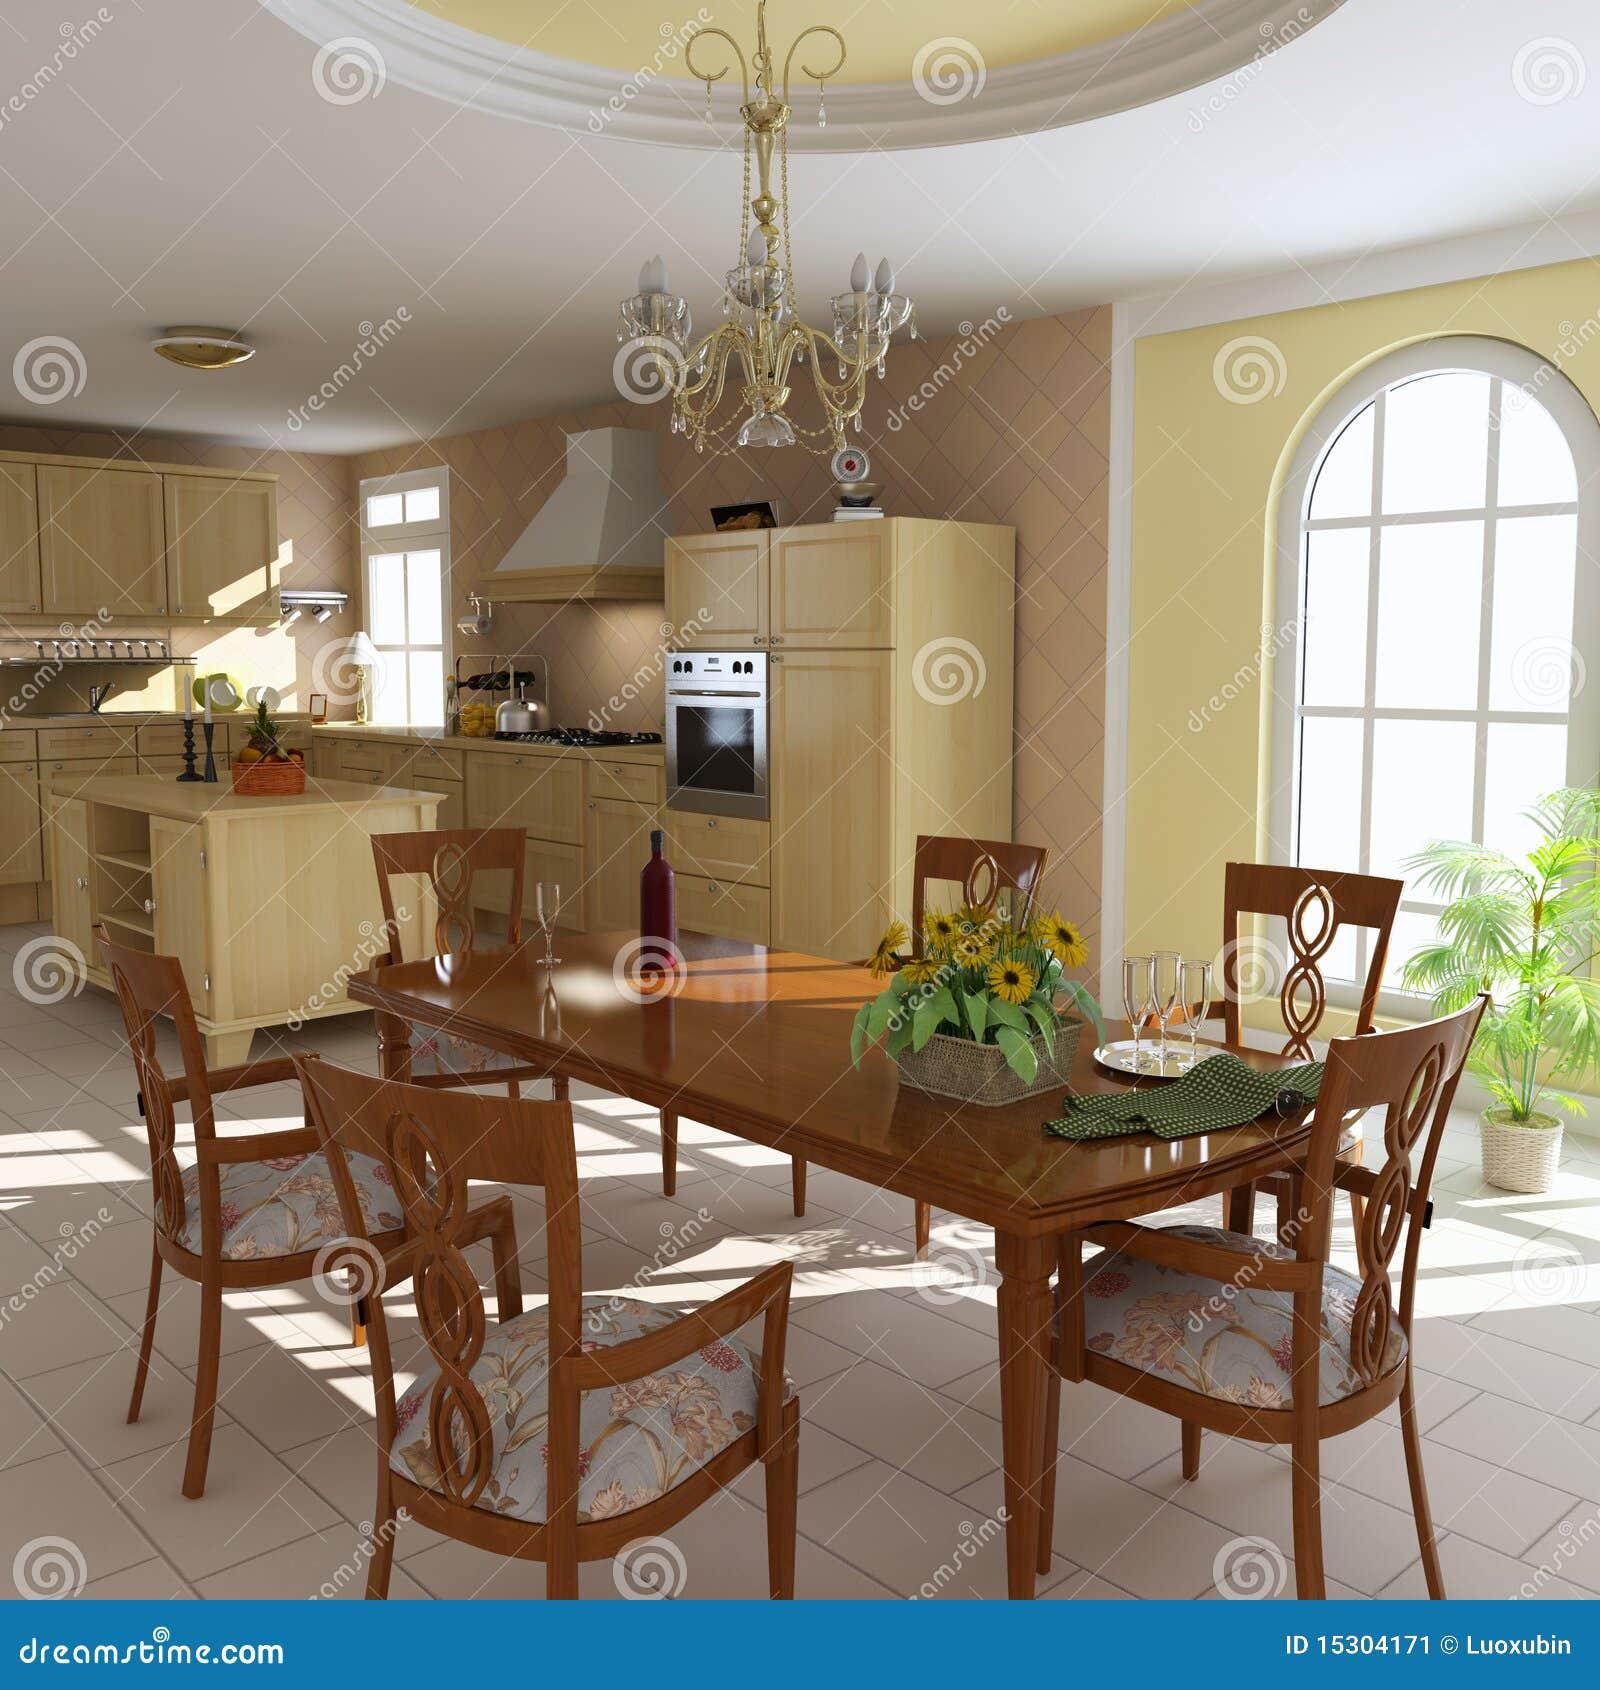 salle manger et cuisine classiques image stock image 15304171. Black Bedroom Furniture Sets. Home Design Ideas